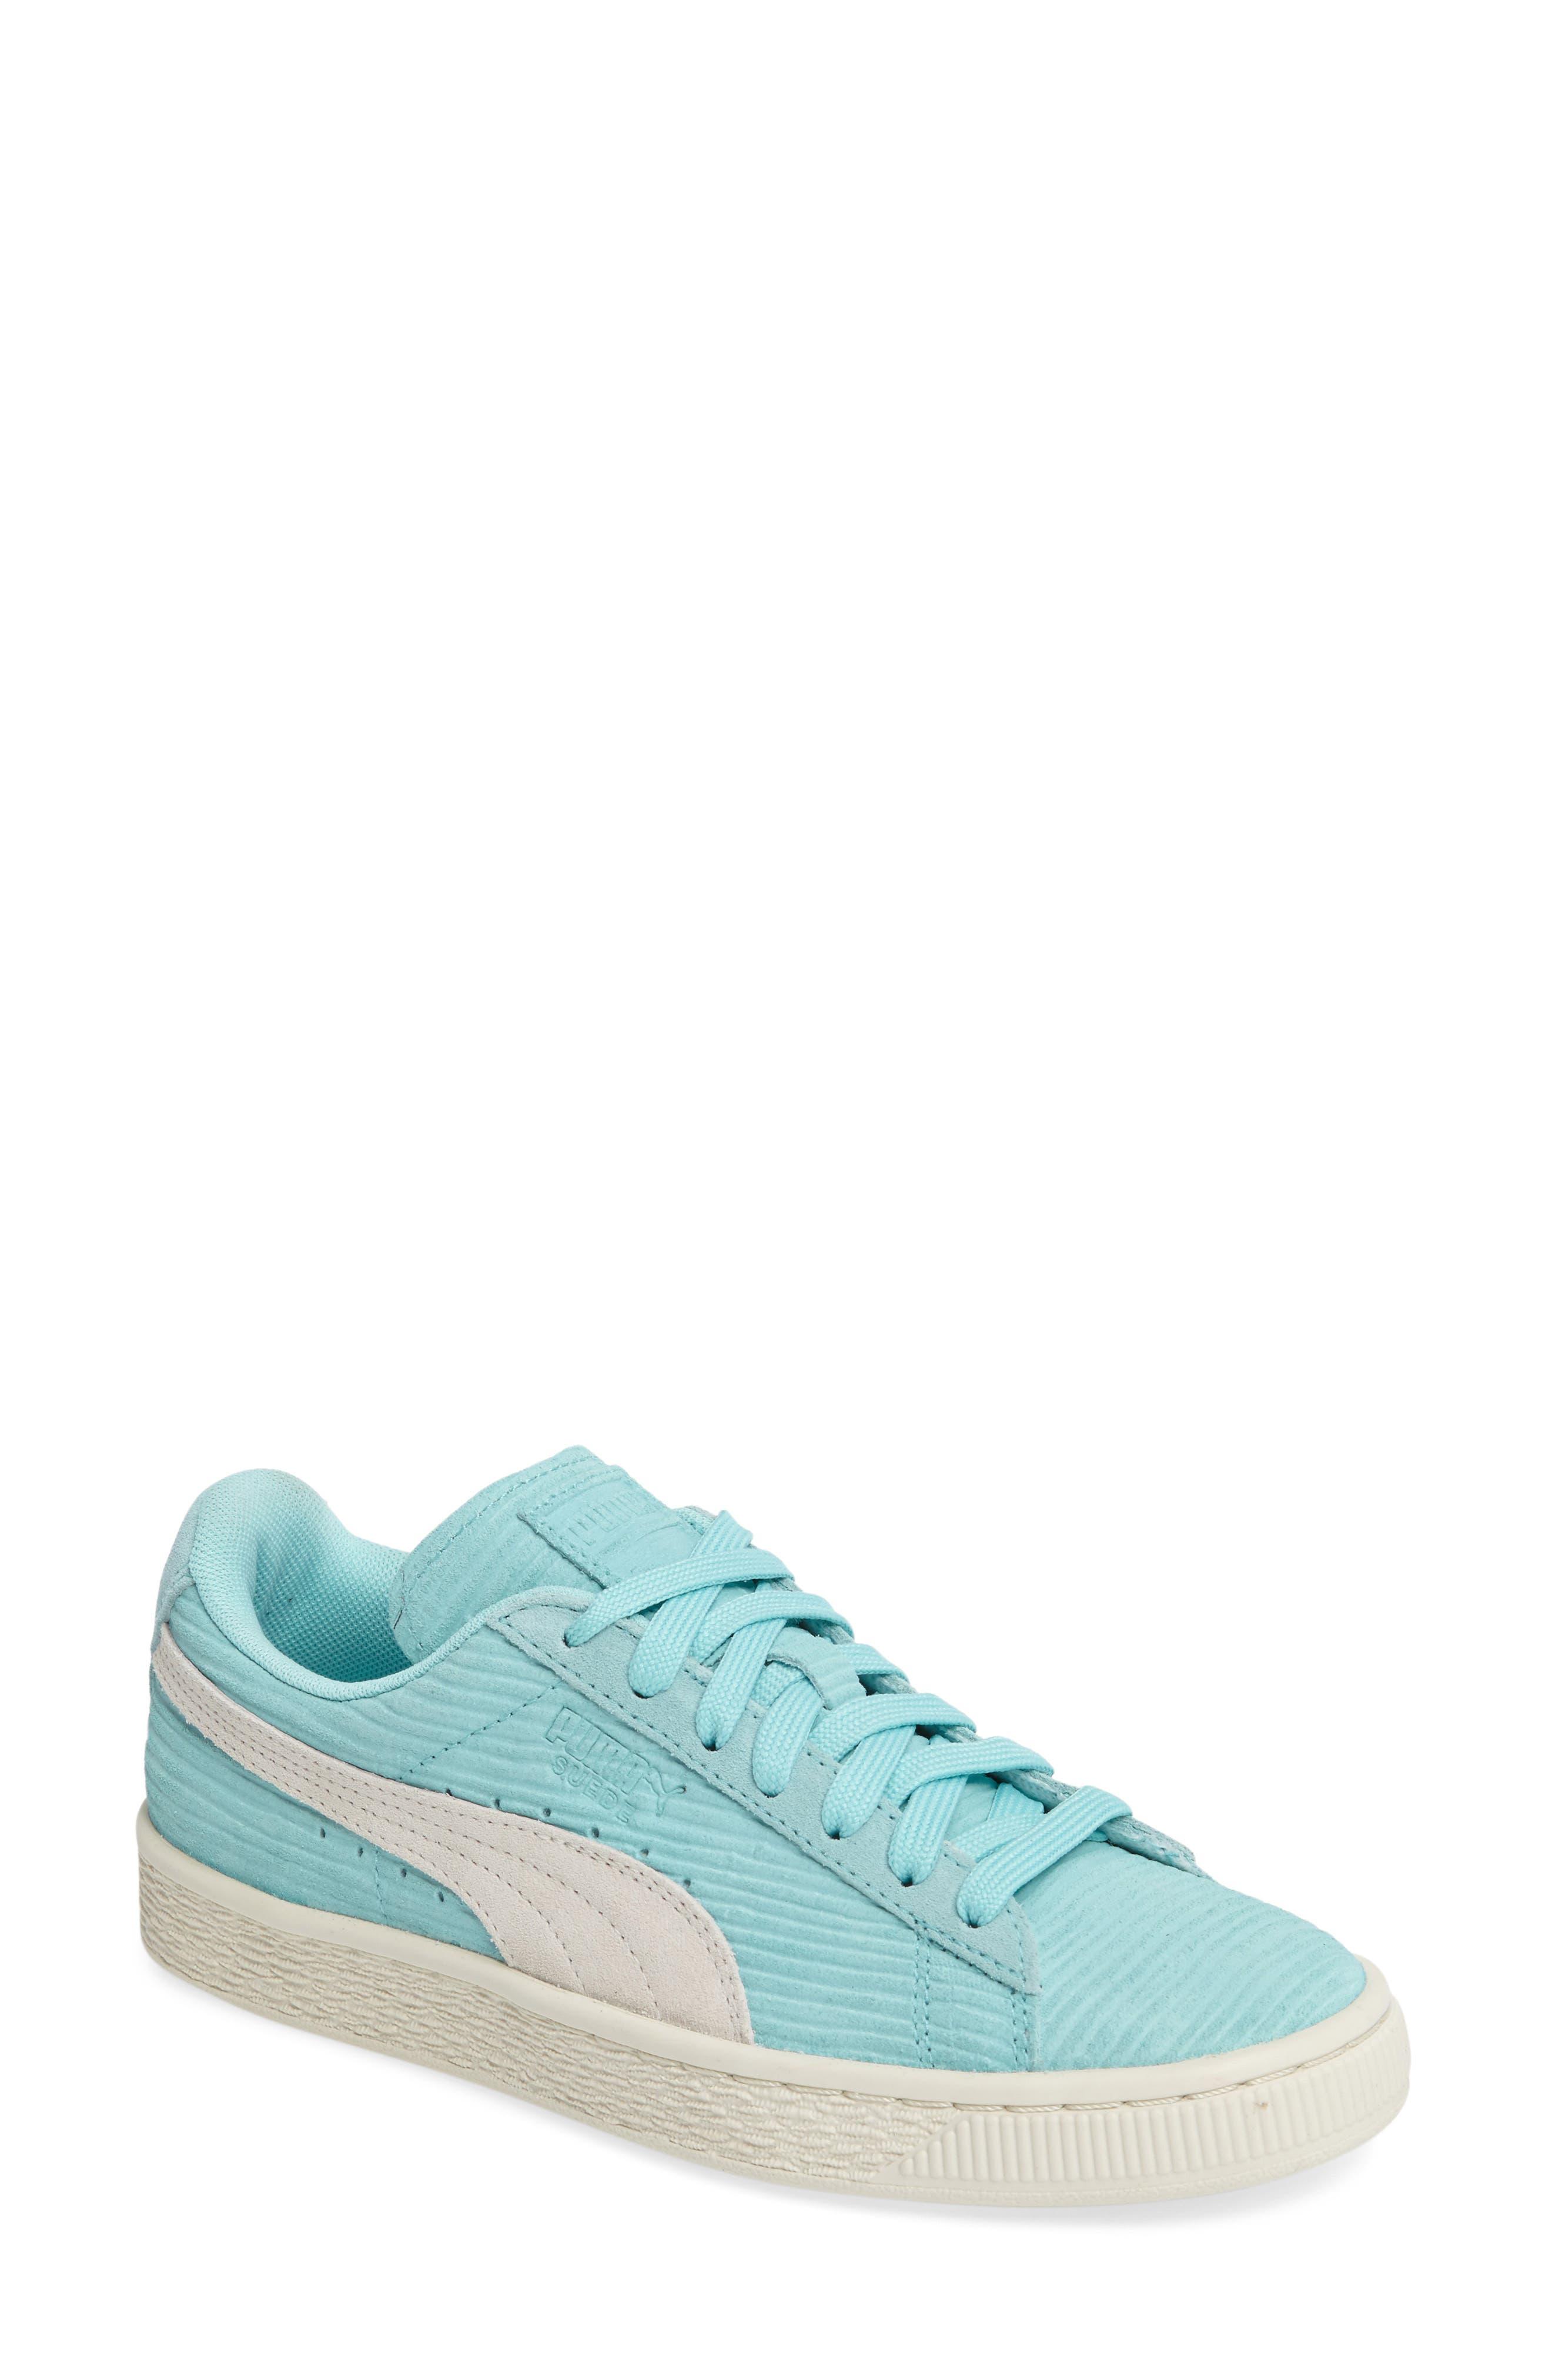 Alternate Image 1 Selected - PUMA Suede Classic Embossed Sneaker (Women)